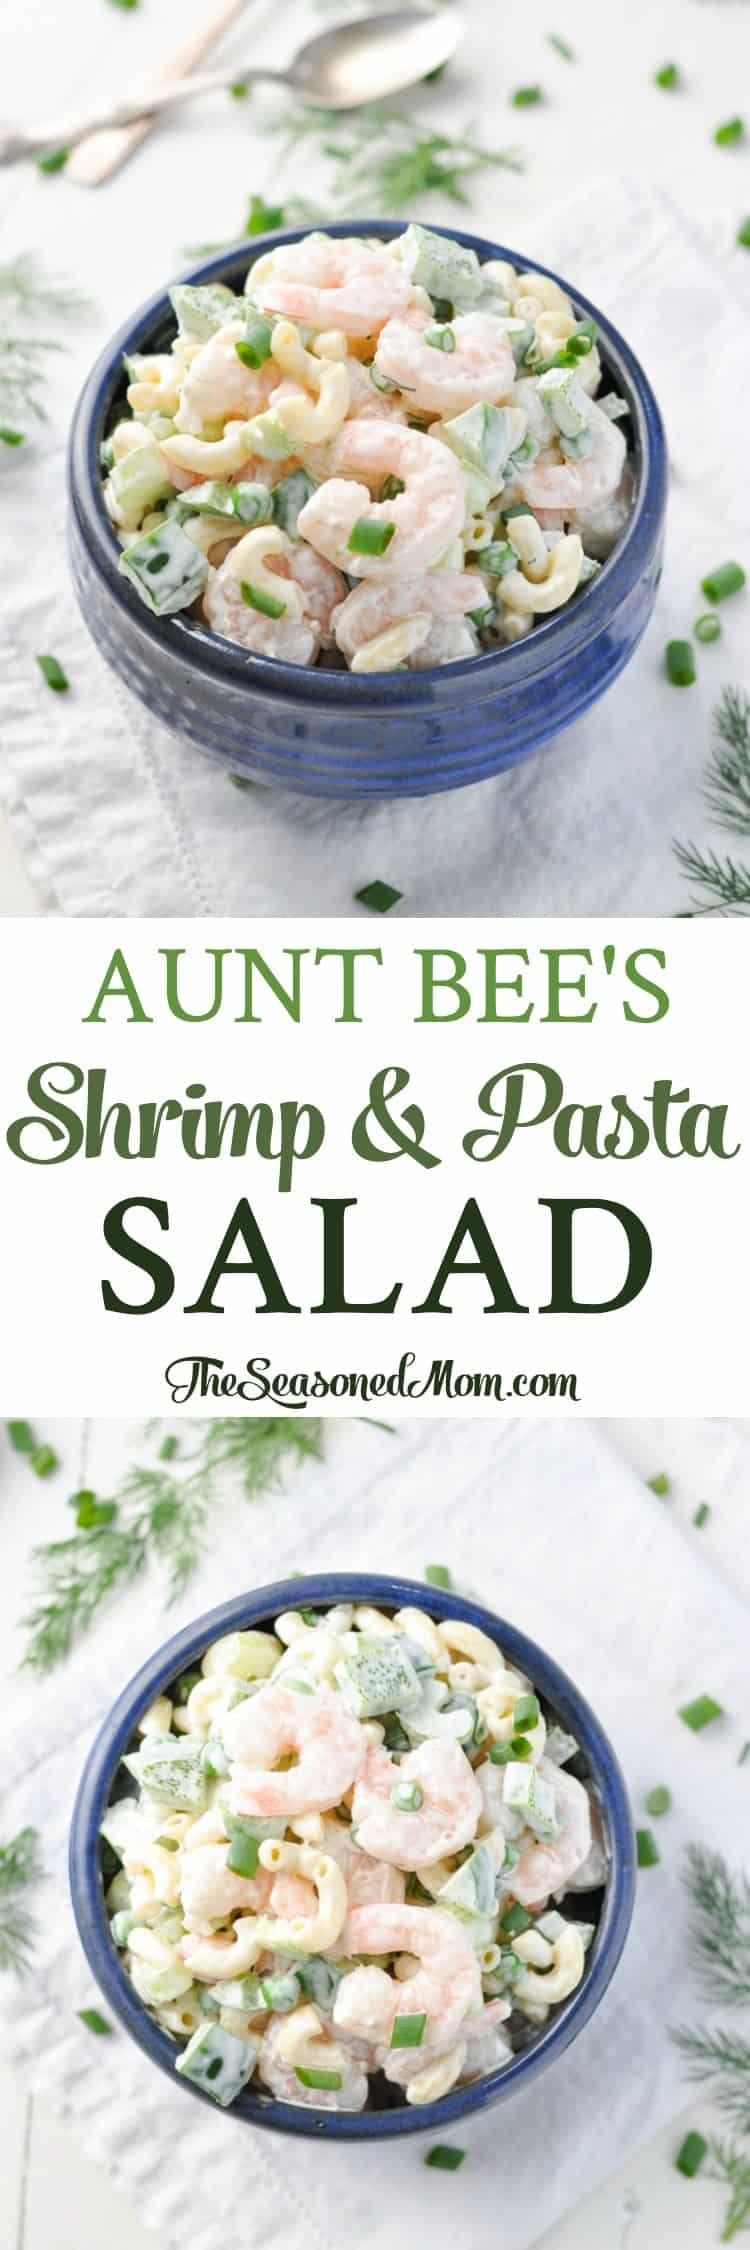 Aunt Bee\'s Shrimp and Pasta Salad - The Seasoned Mom